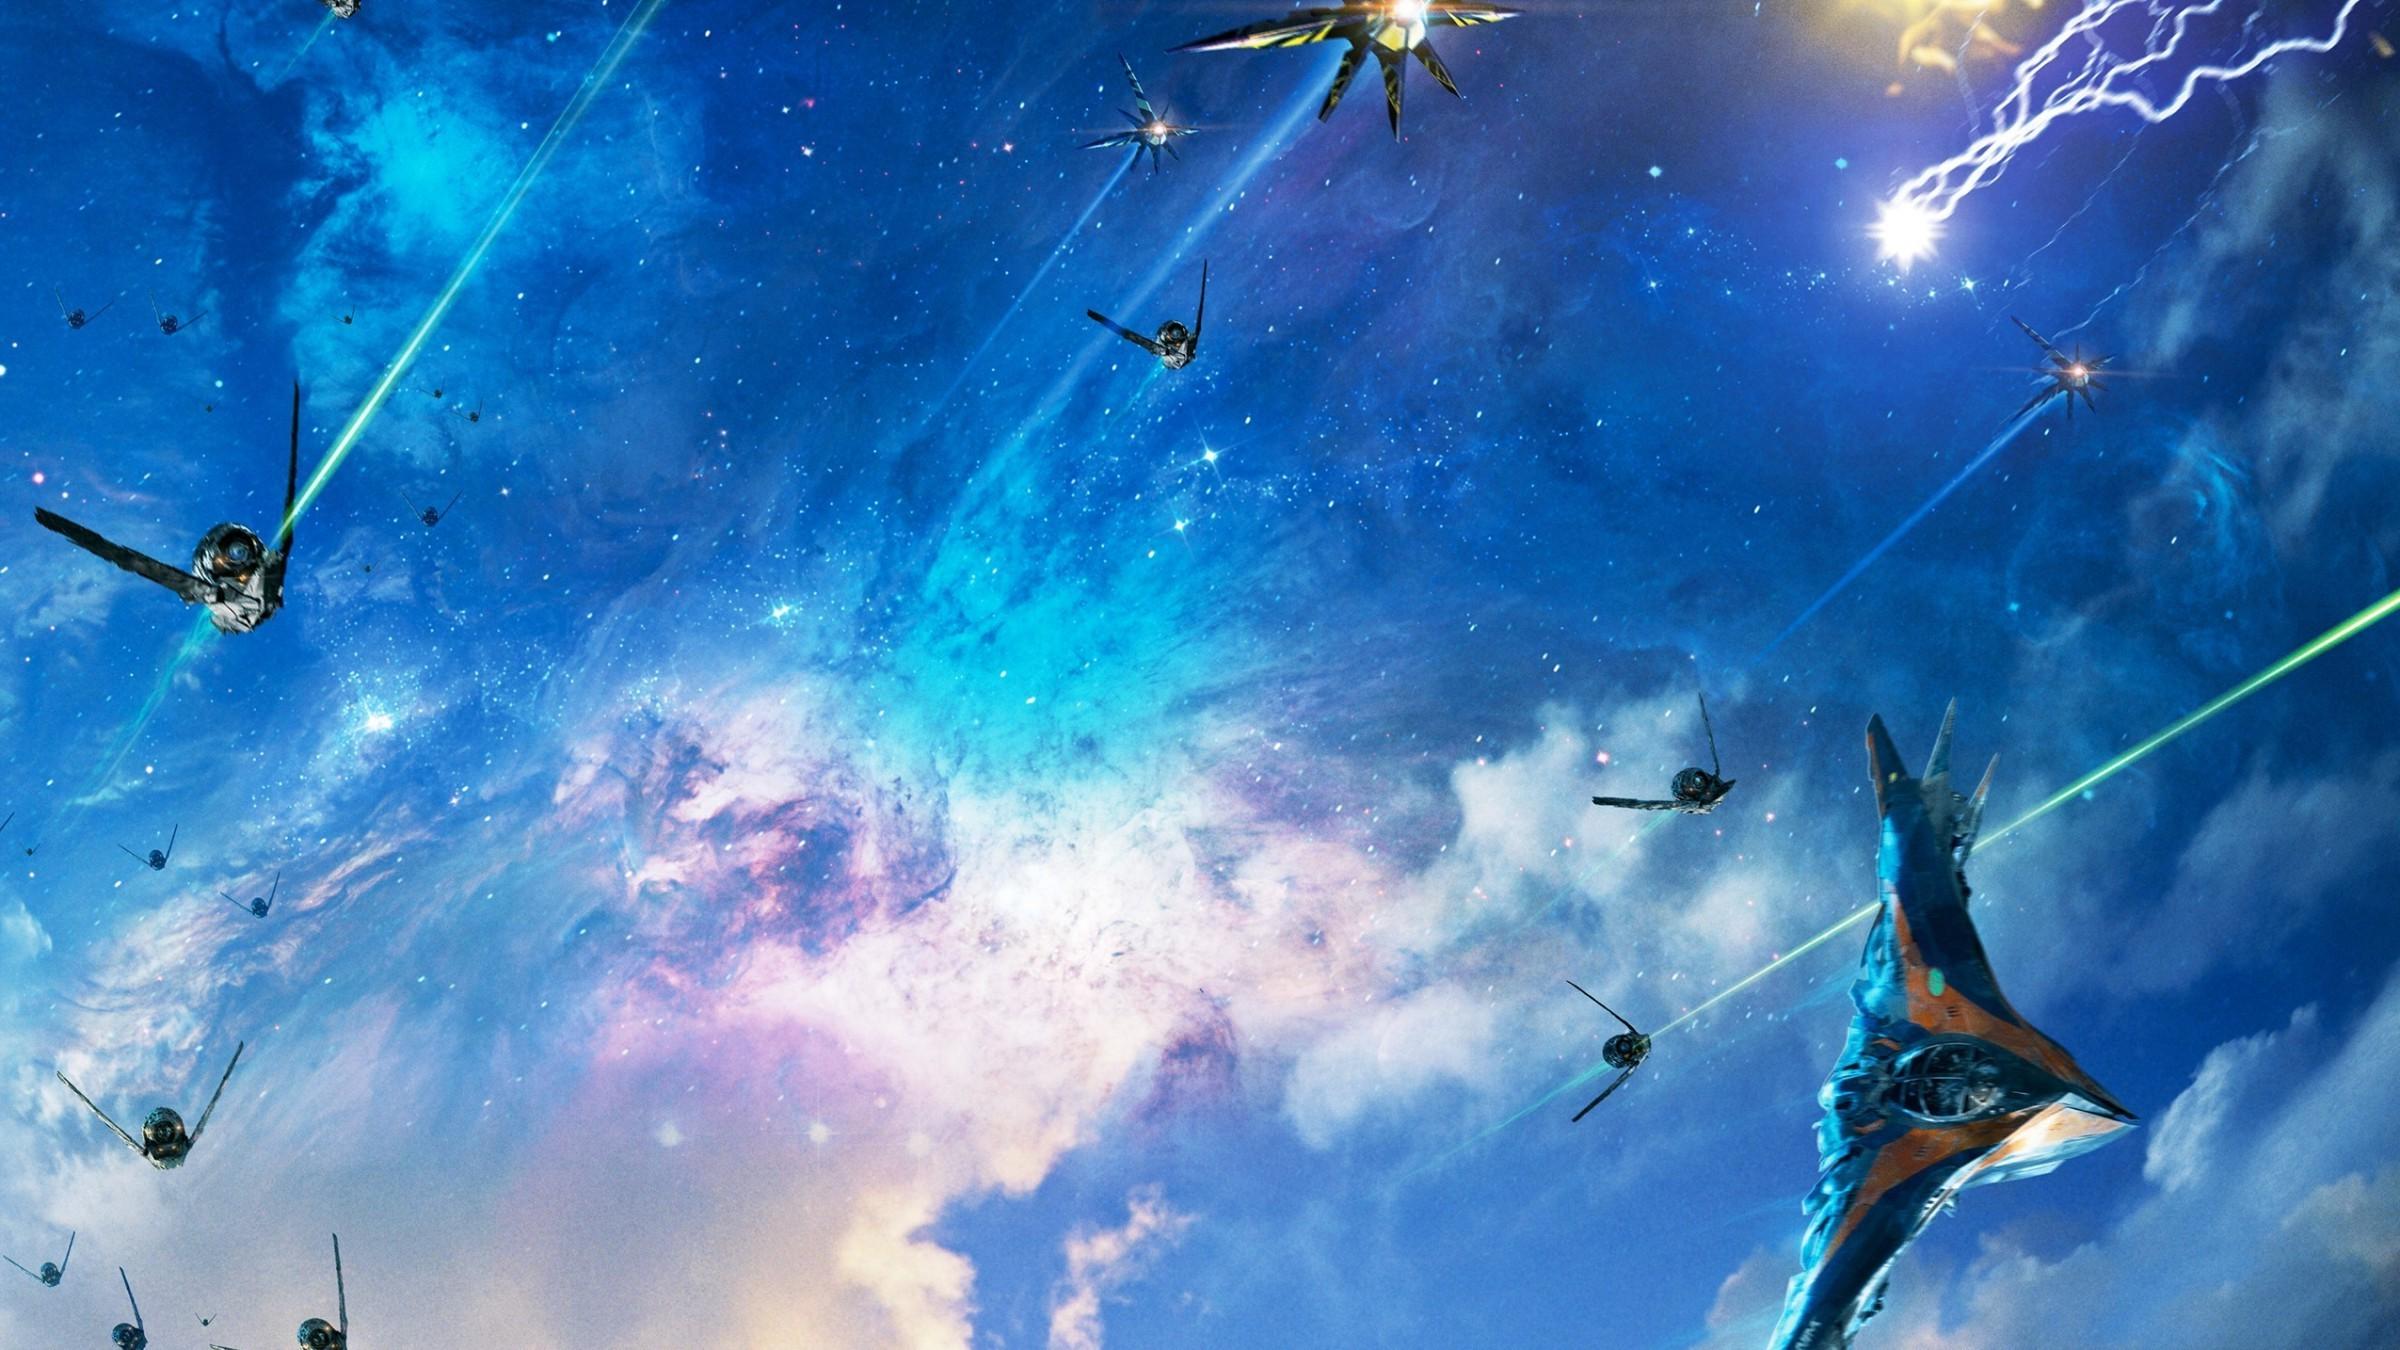 Wallpaper : 2400x1350 Px, Drax The Destroyer, Gamora